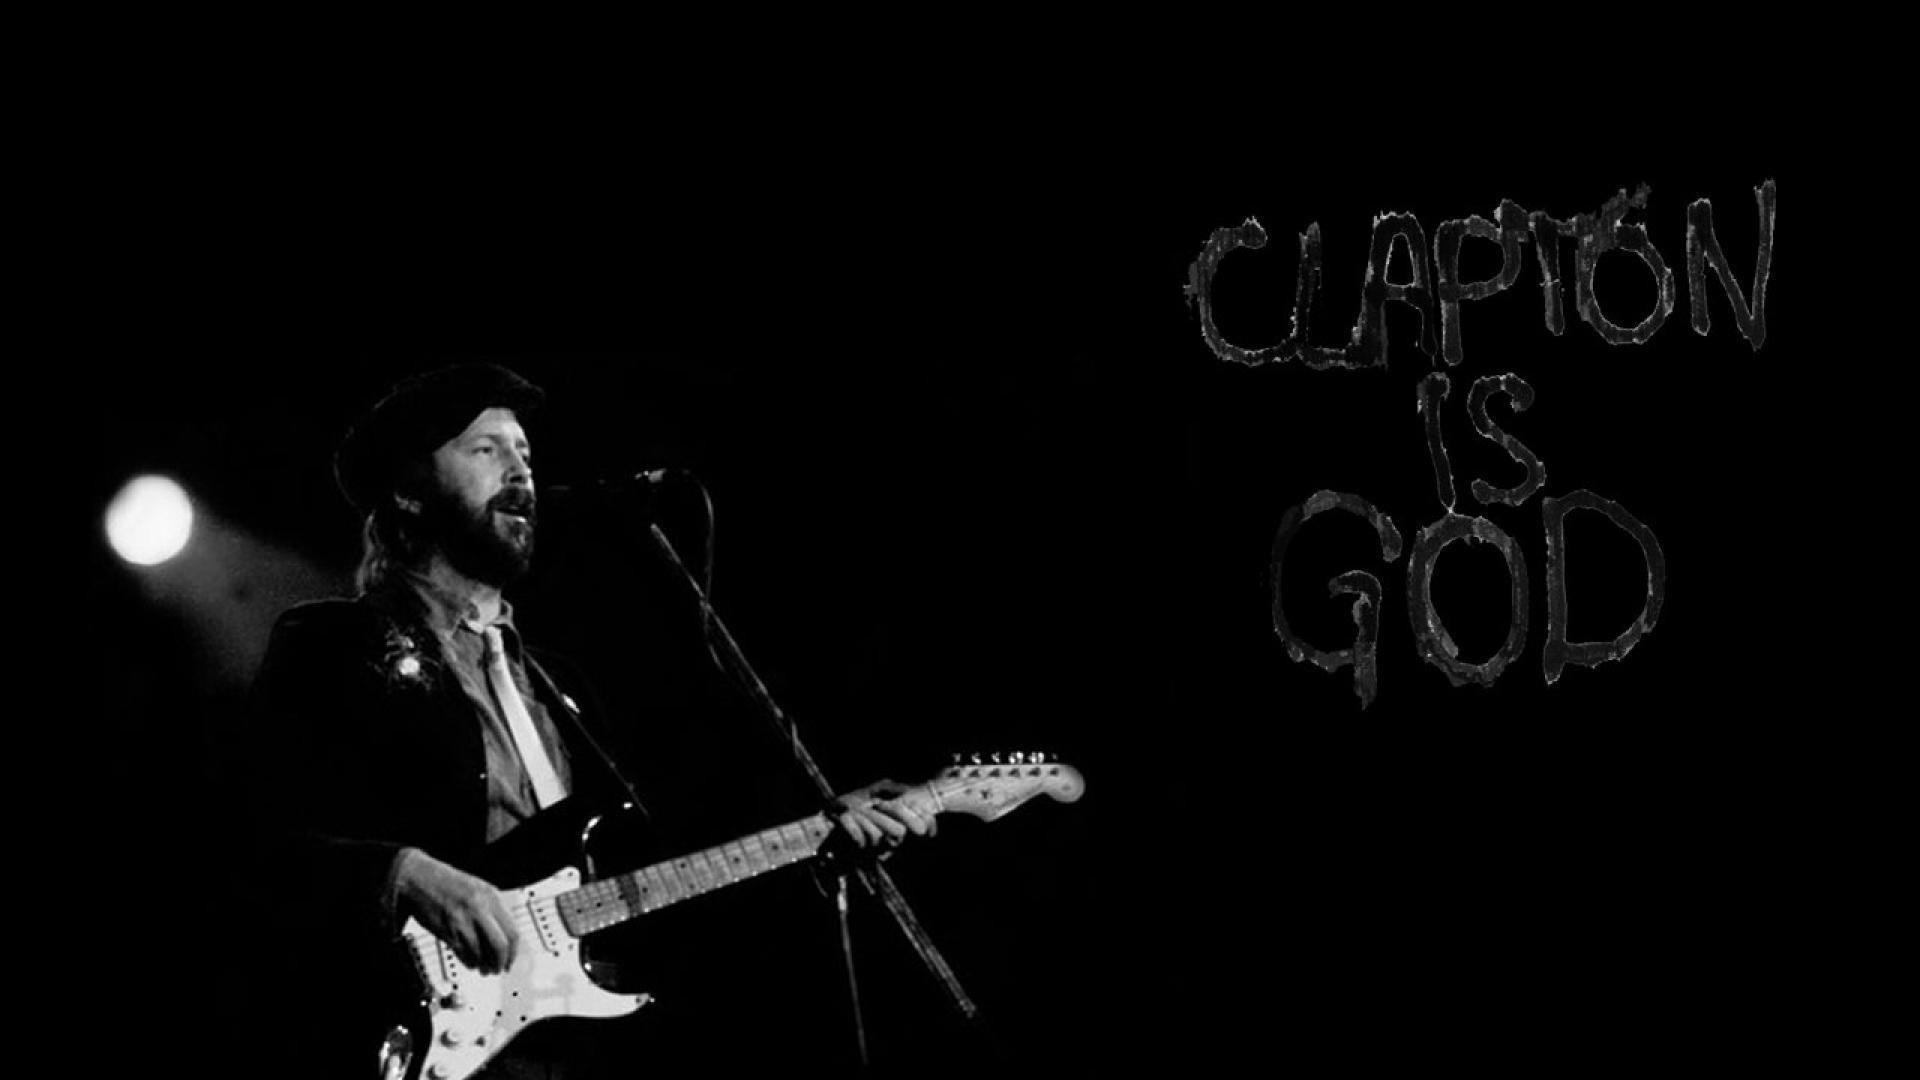 Eric Clapton Wallpaper Hd